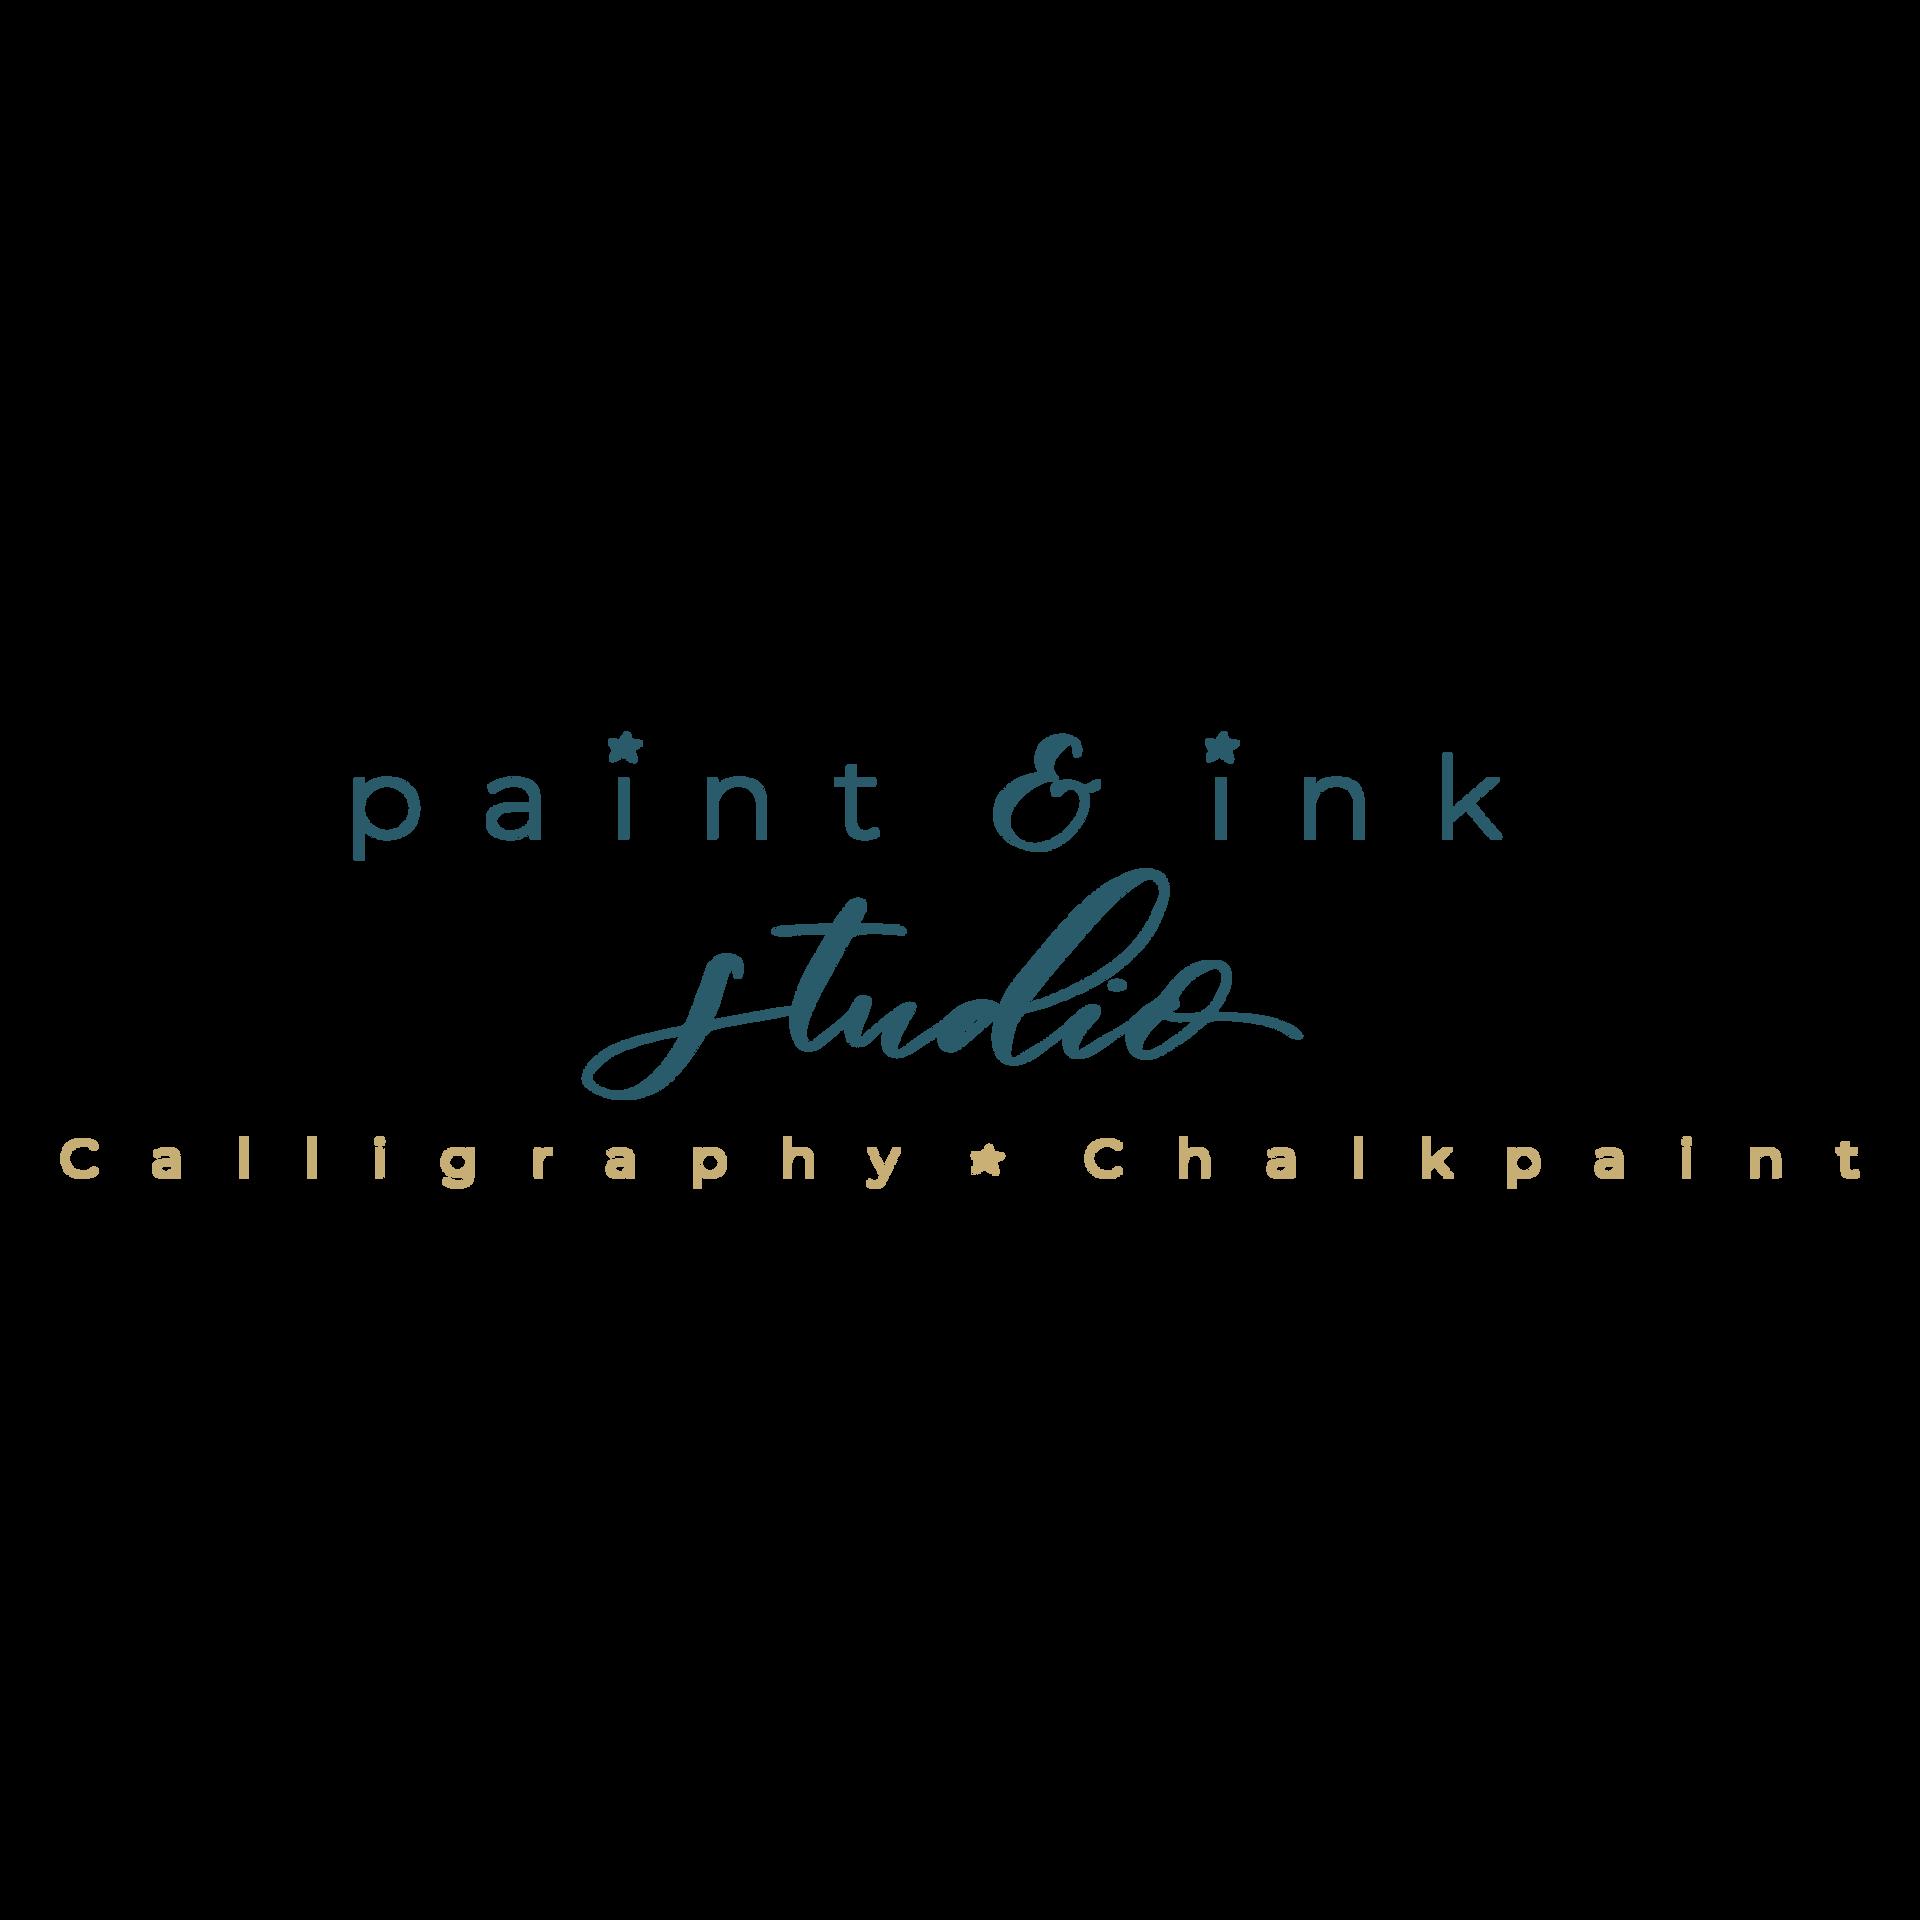 Calligrapher Branding | Brand Identity Design by Fresh Leaf Creative | Dorset Brand Designer & Photographer